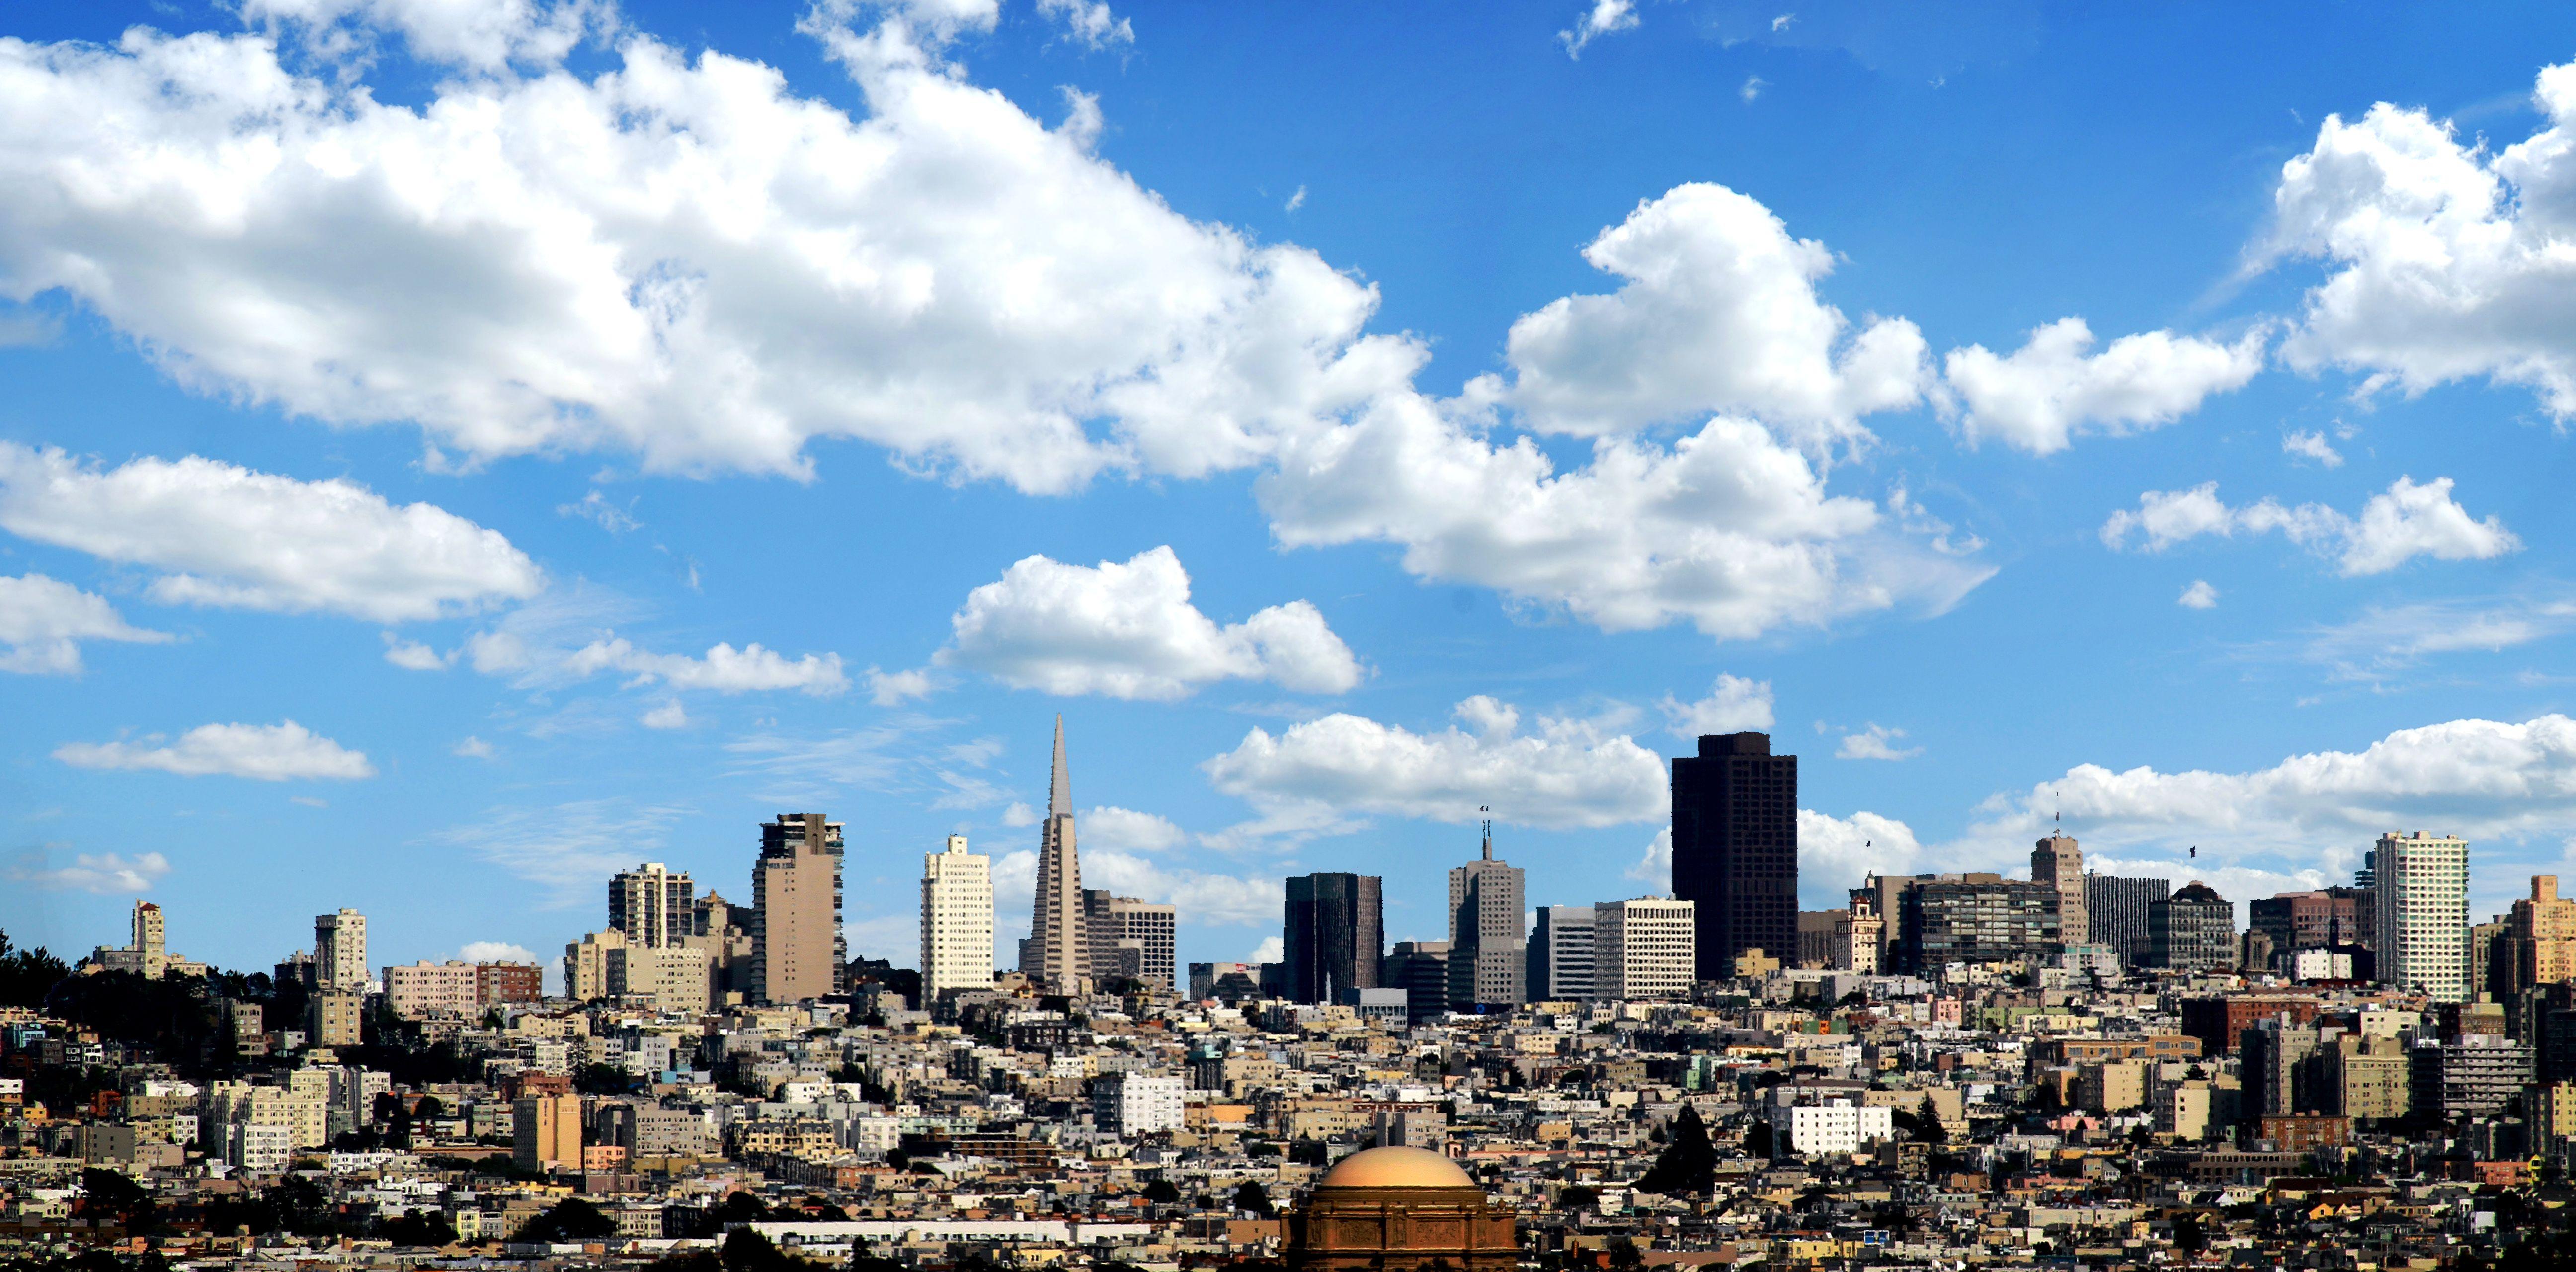 The City by the Bay - San Francisco, CA